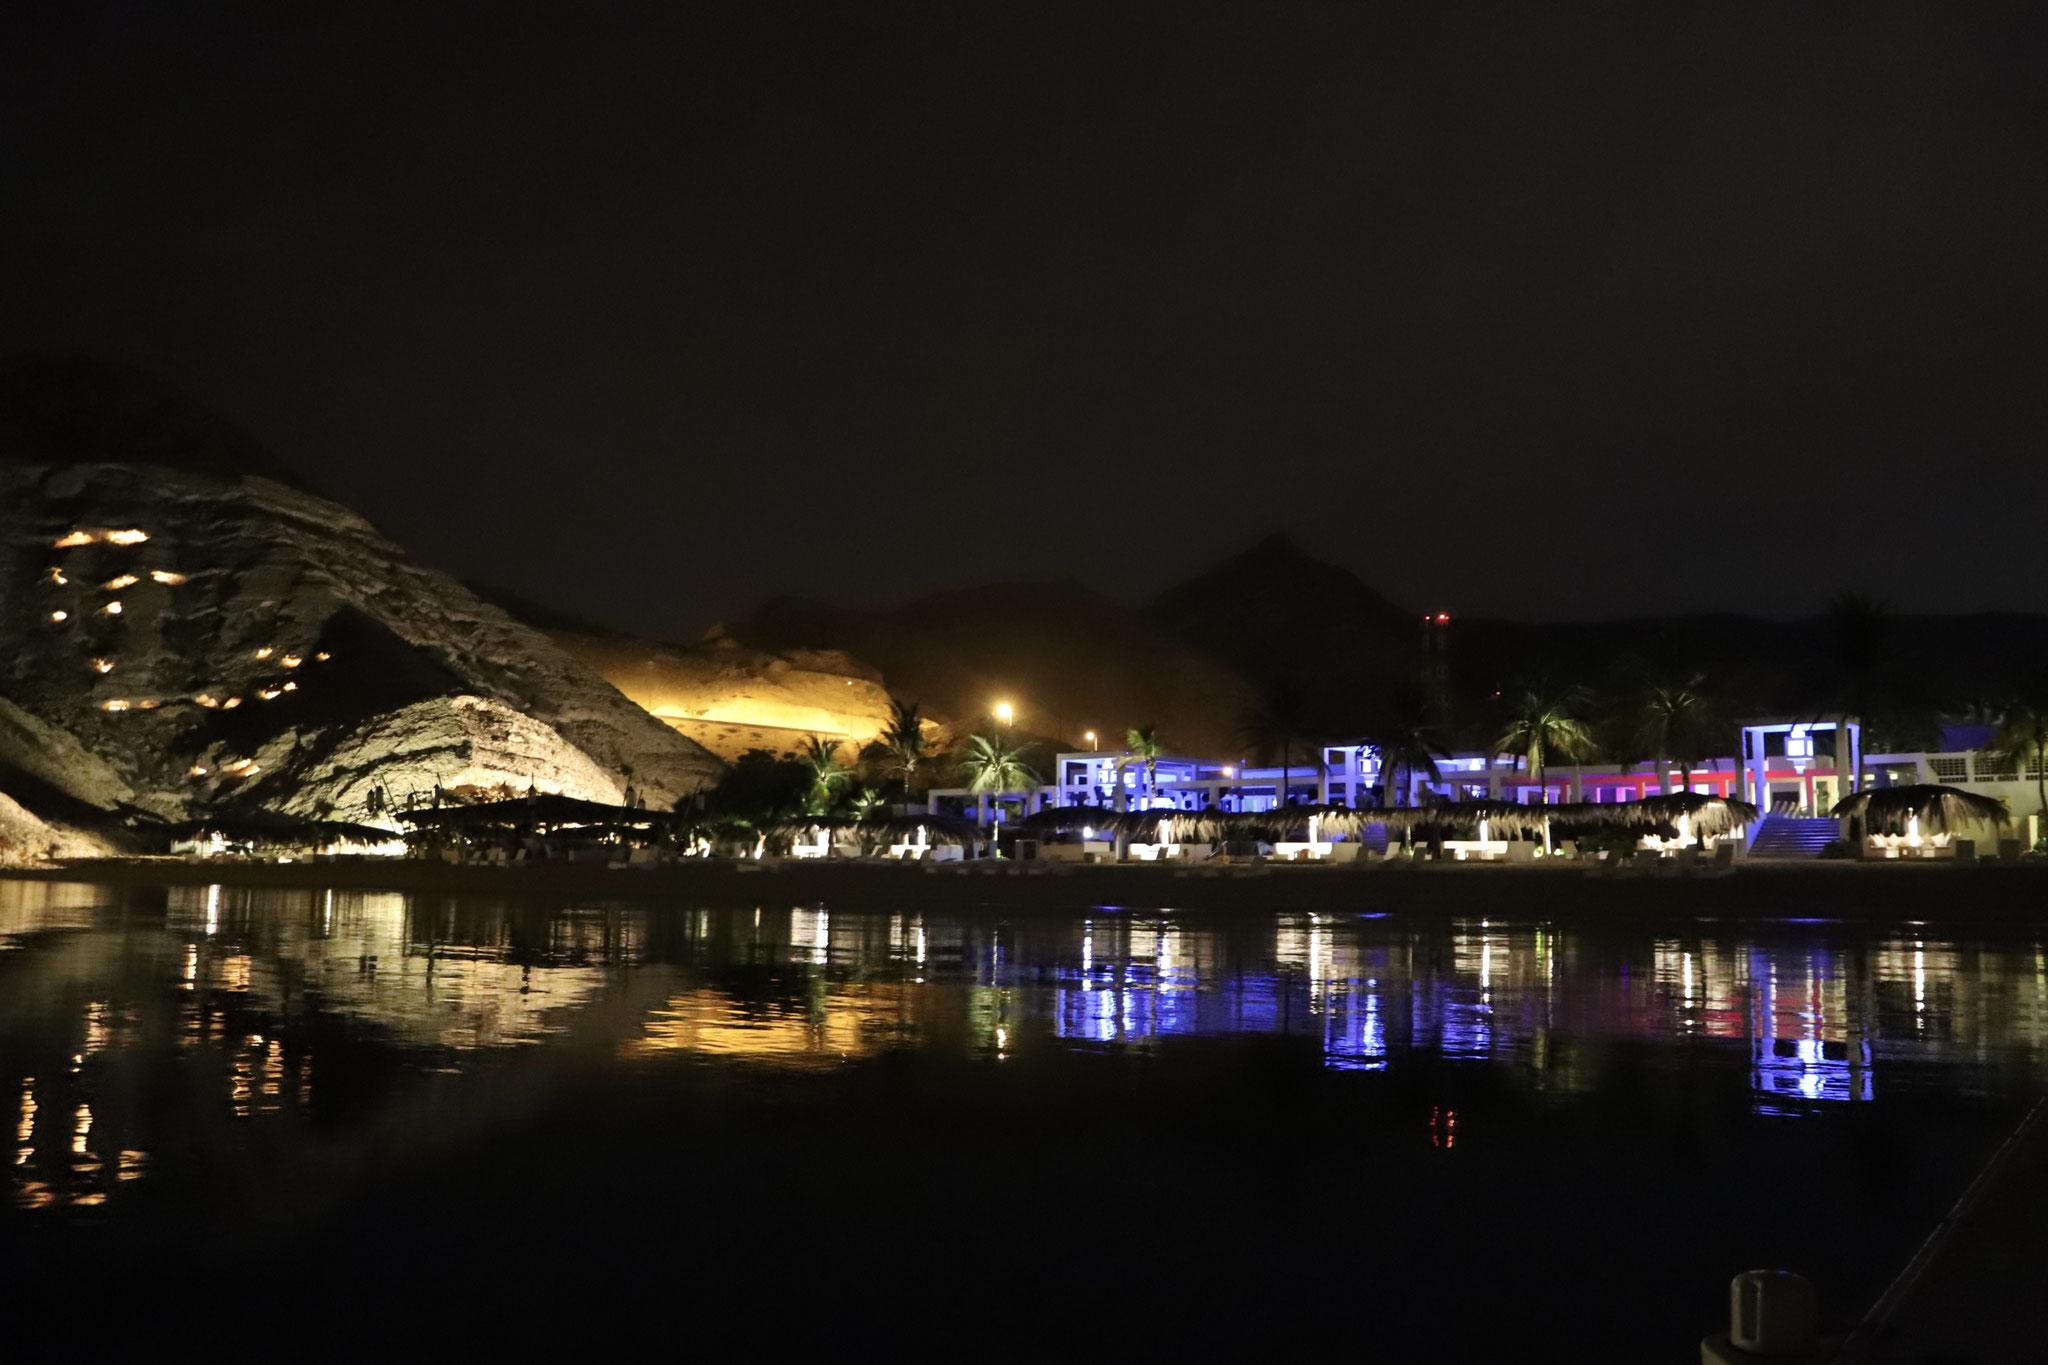 Muscat Hills Resort by night